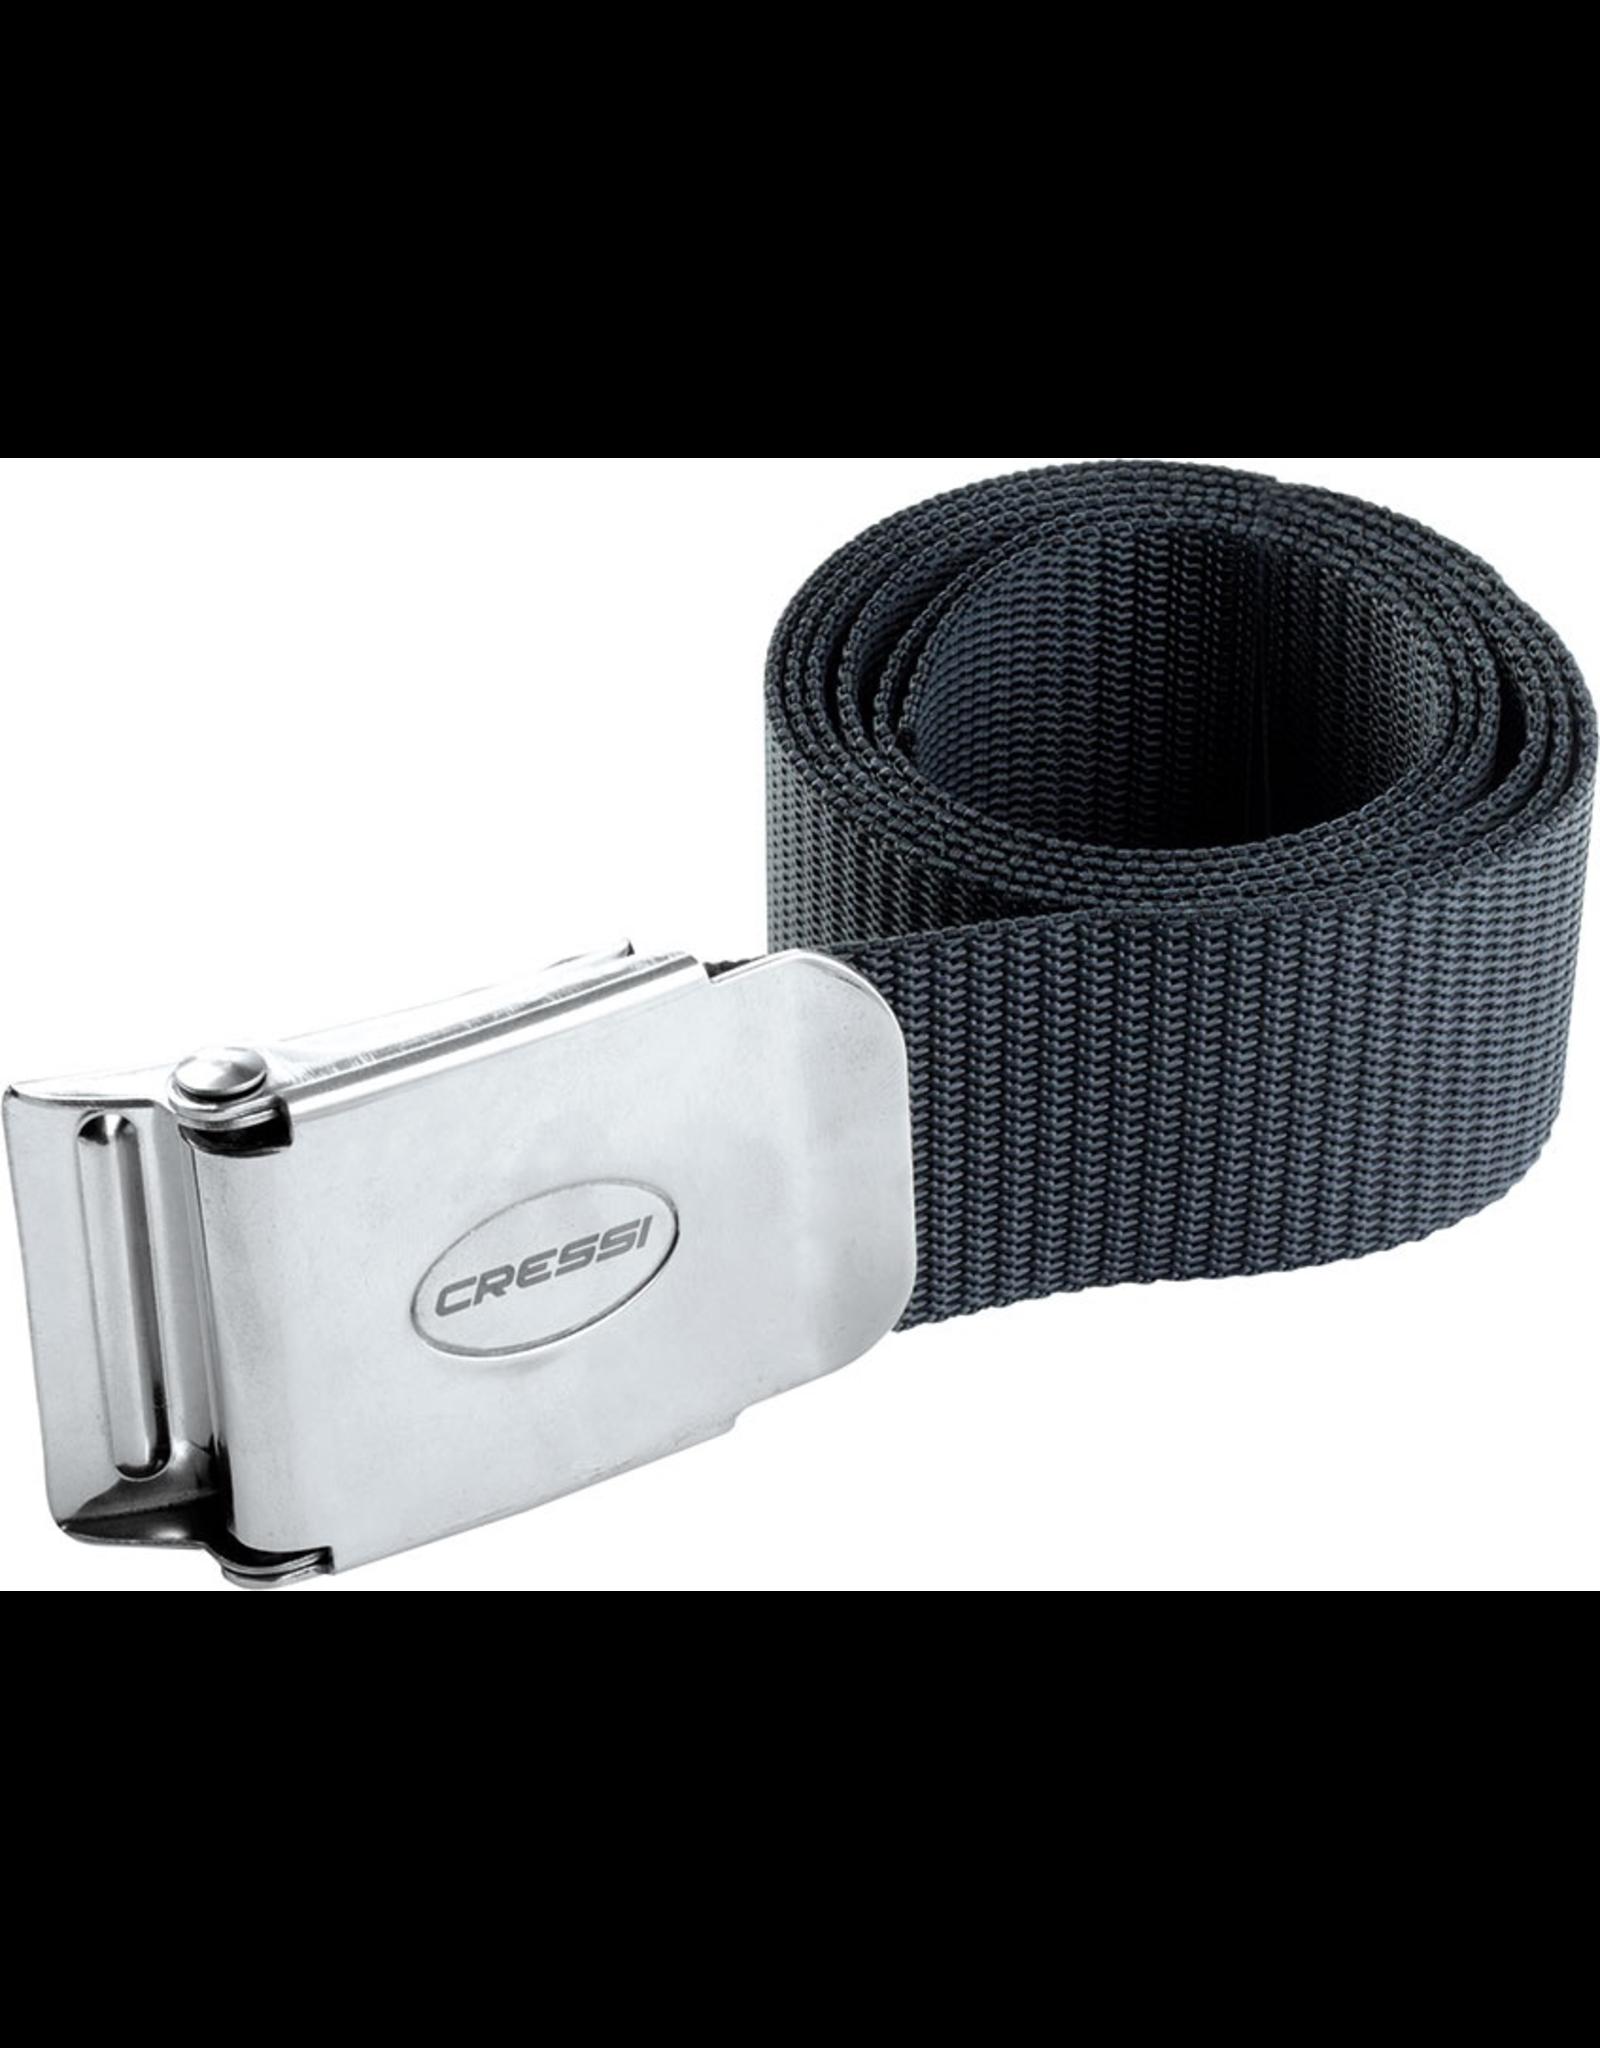 Cressi Cressi Nylon Weight Belt